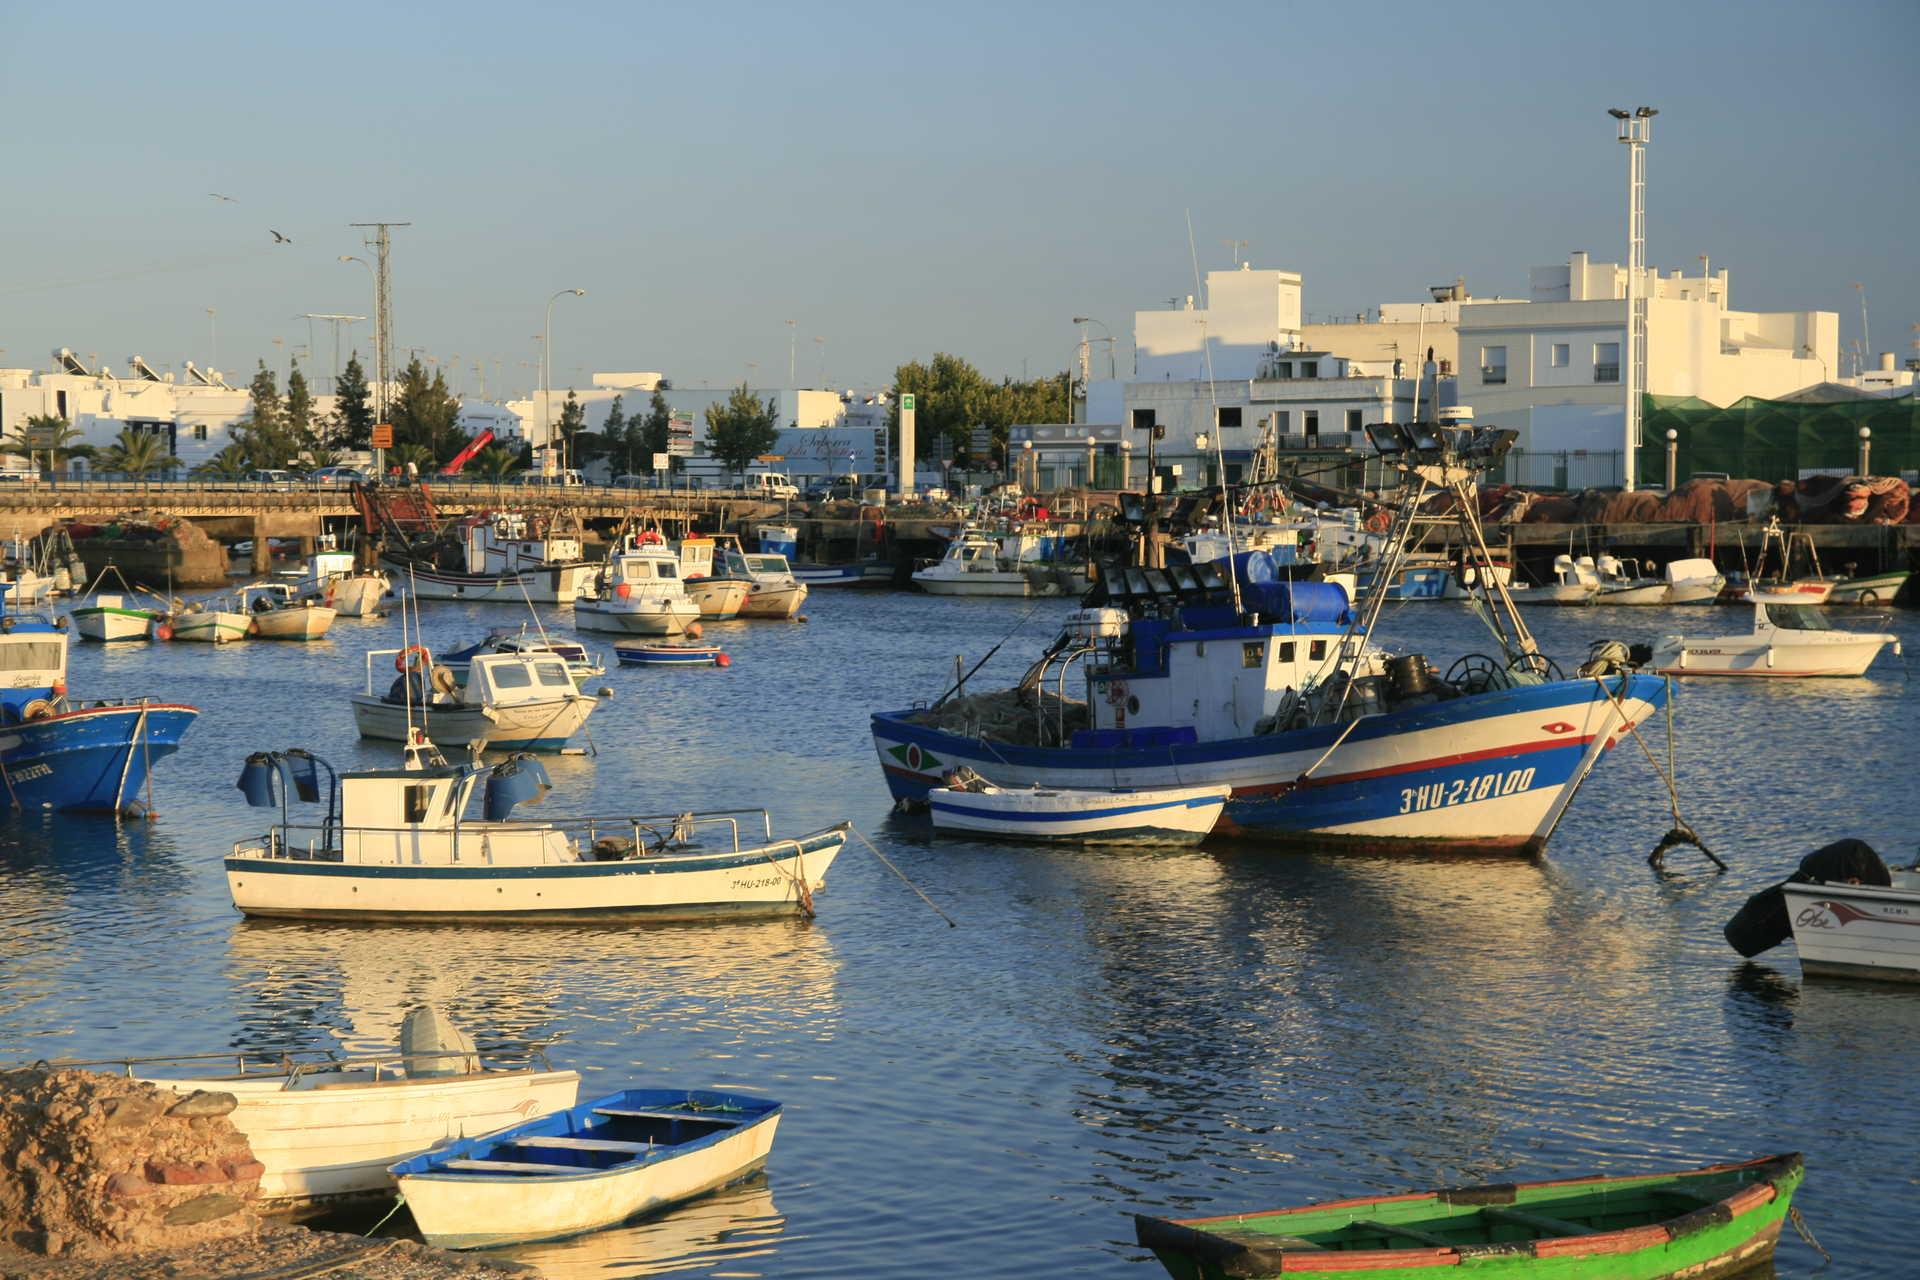 Birds and heritage of the marshland and port of Isla Cristina